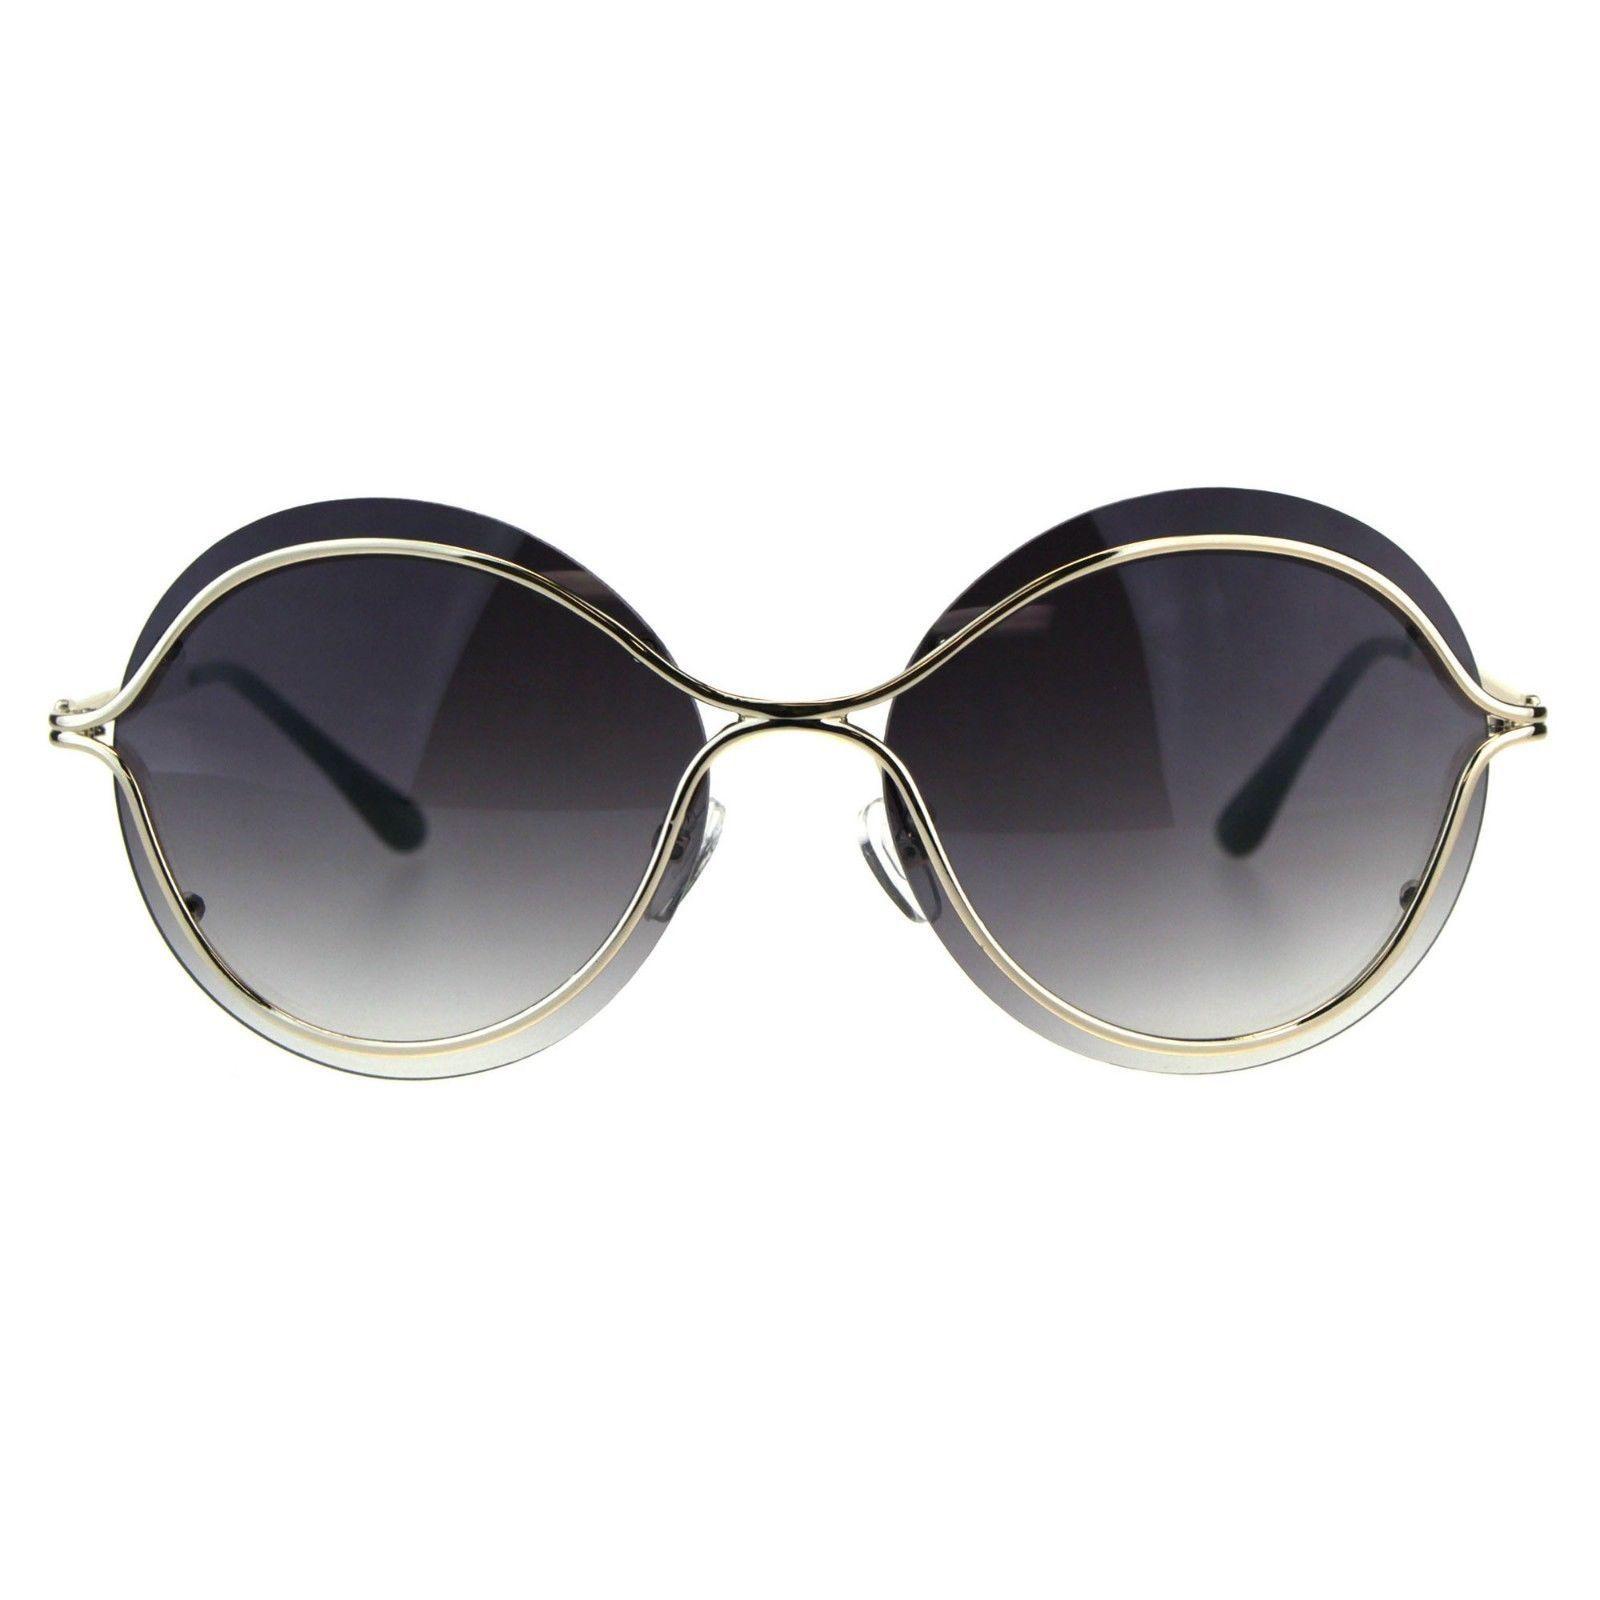 Womens Round Sunglasses Unique Gold Metal Rims Over Lens UV 400